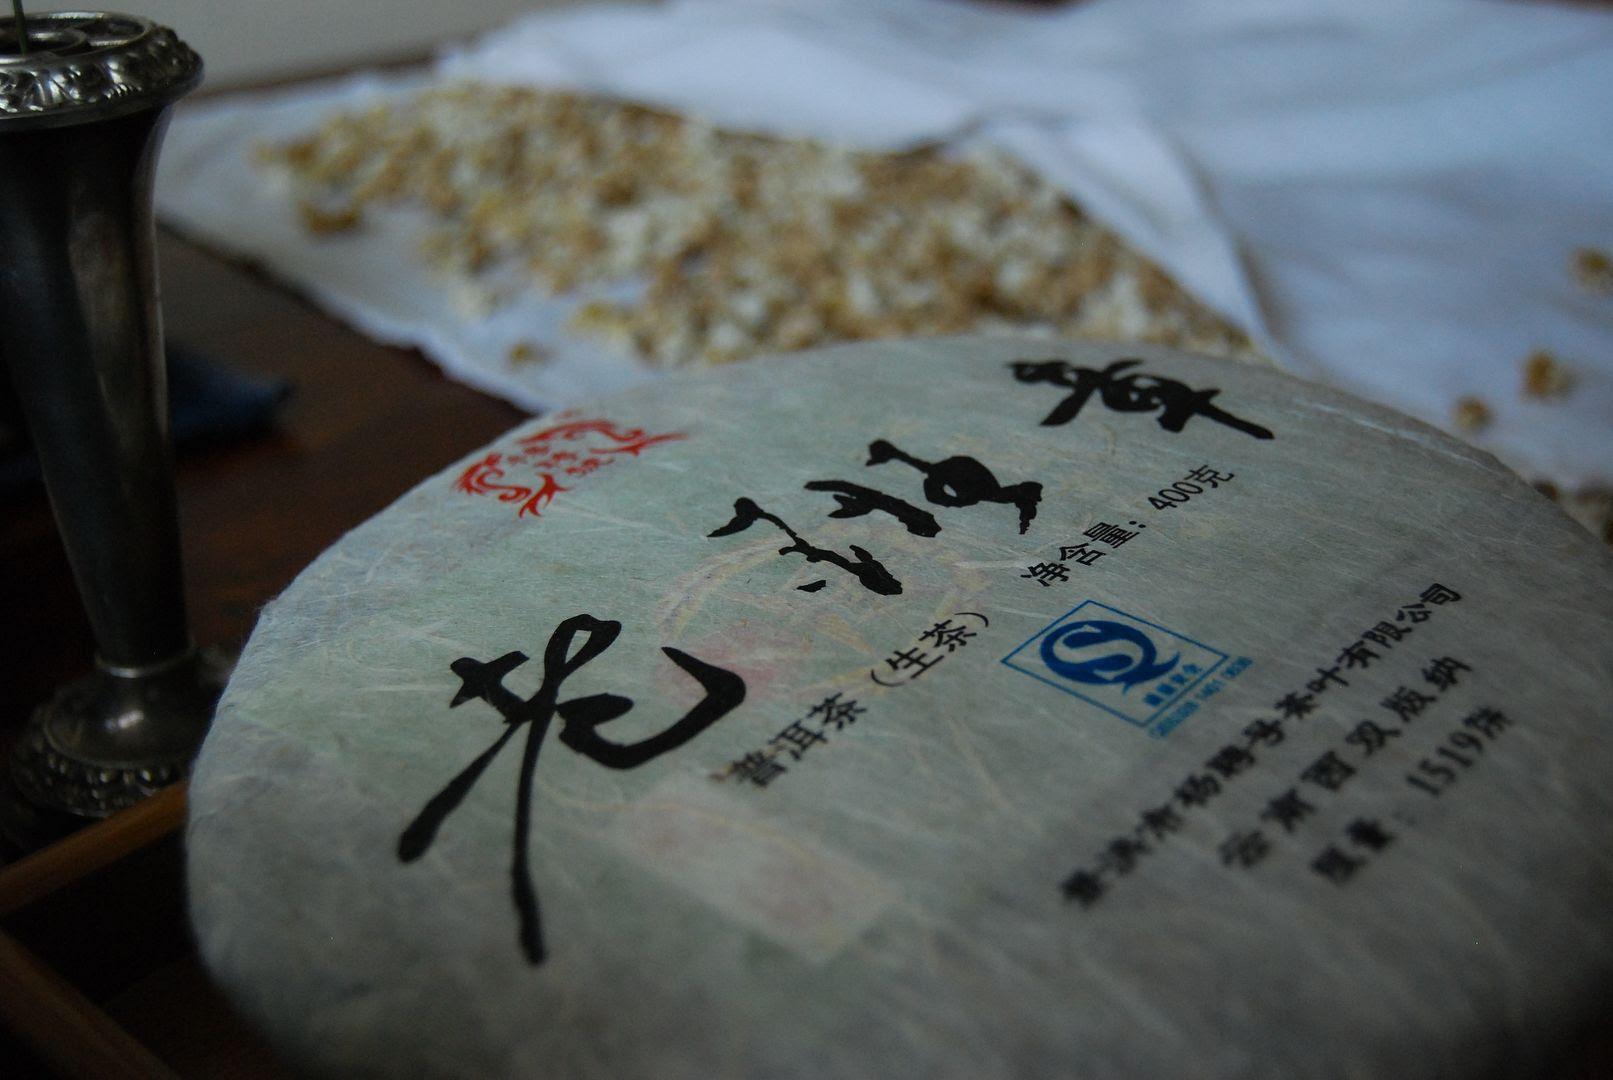 2009 Yangpinhao Laobanzhang